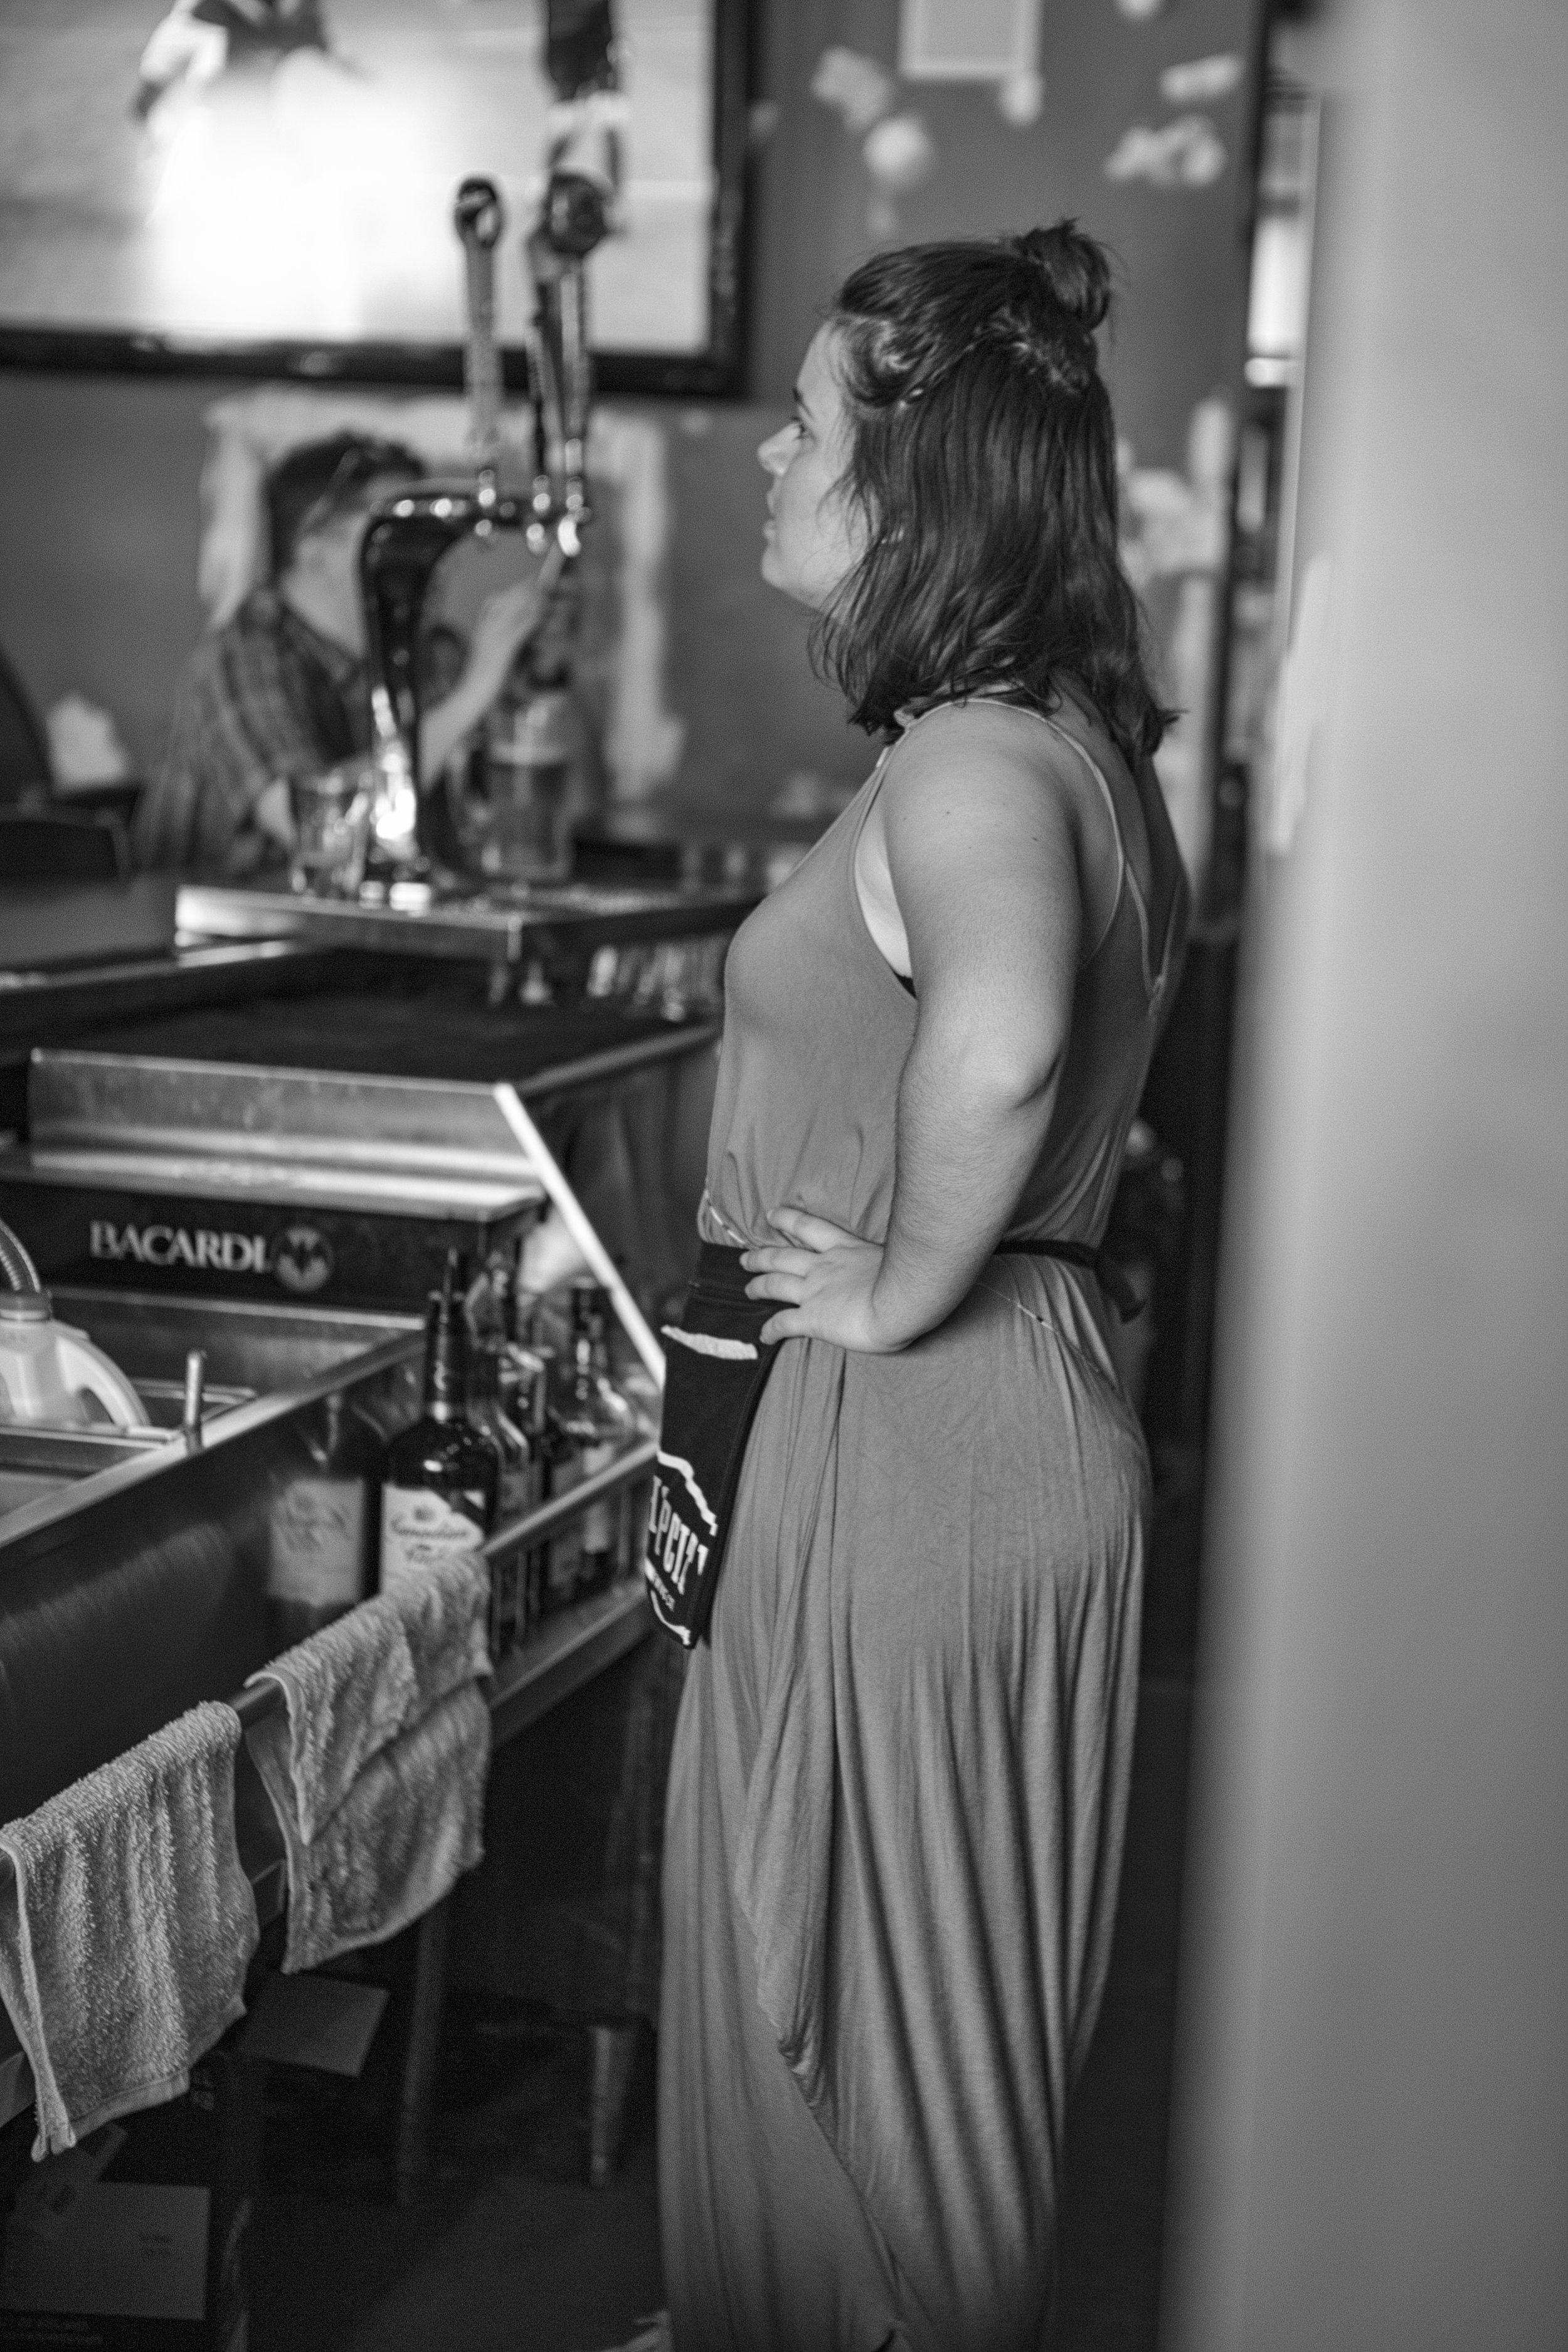 Street Photography - 21 Jul '17 - The Berryman Pub - Agathe.JPG